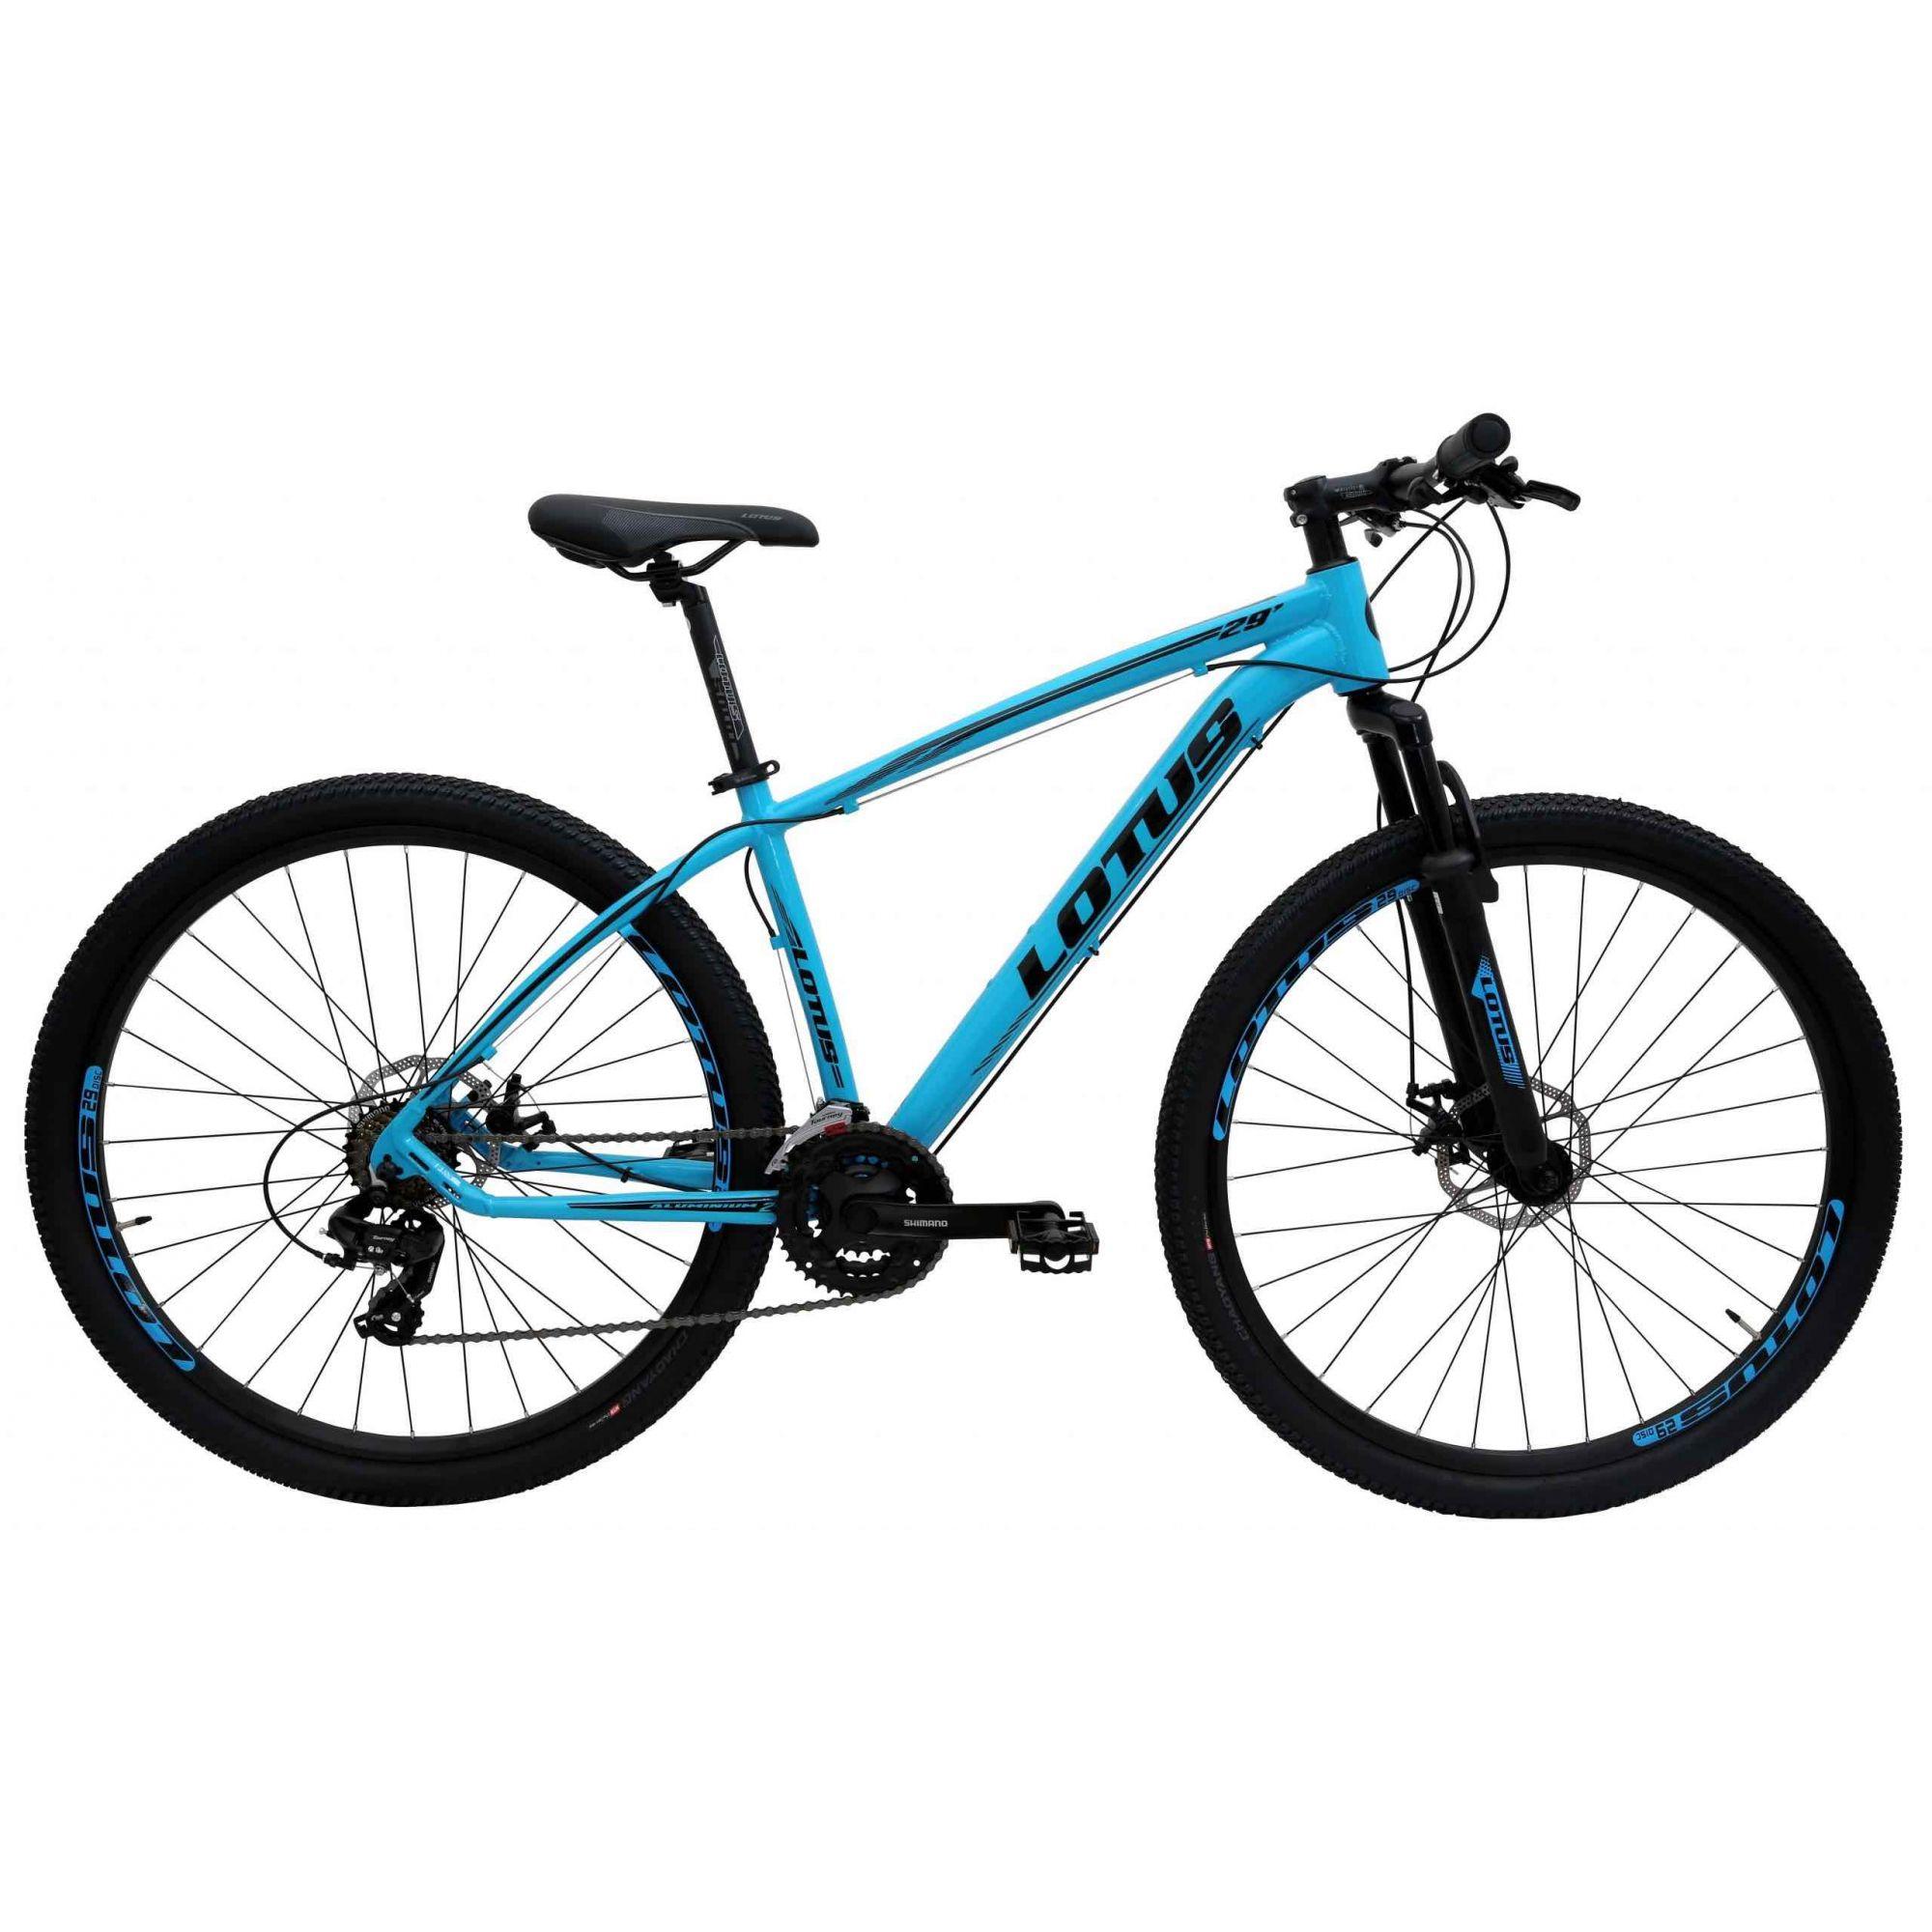 Bicicleta Aro 29 Bike Lotus ? ALUMINIUM 317324 Azul/Preto